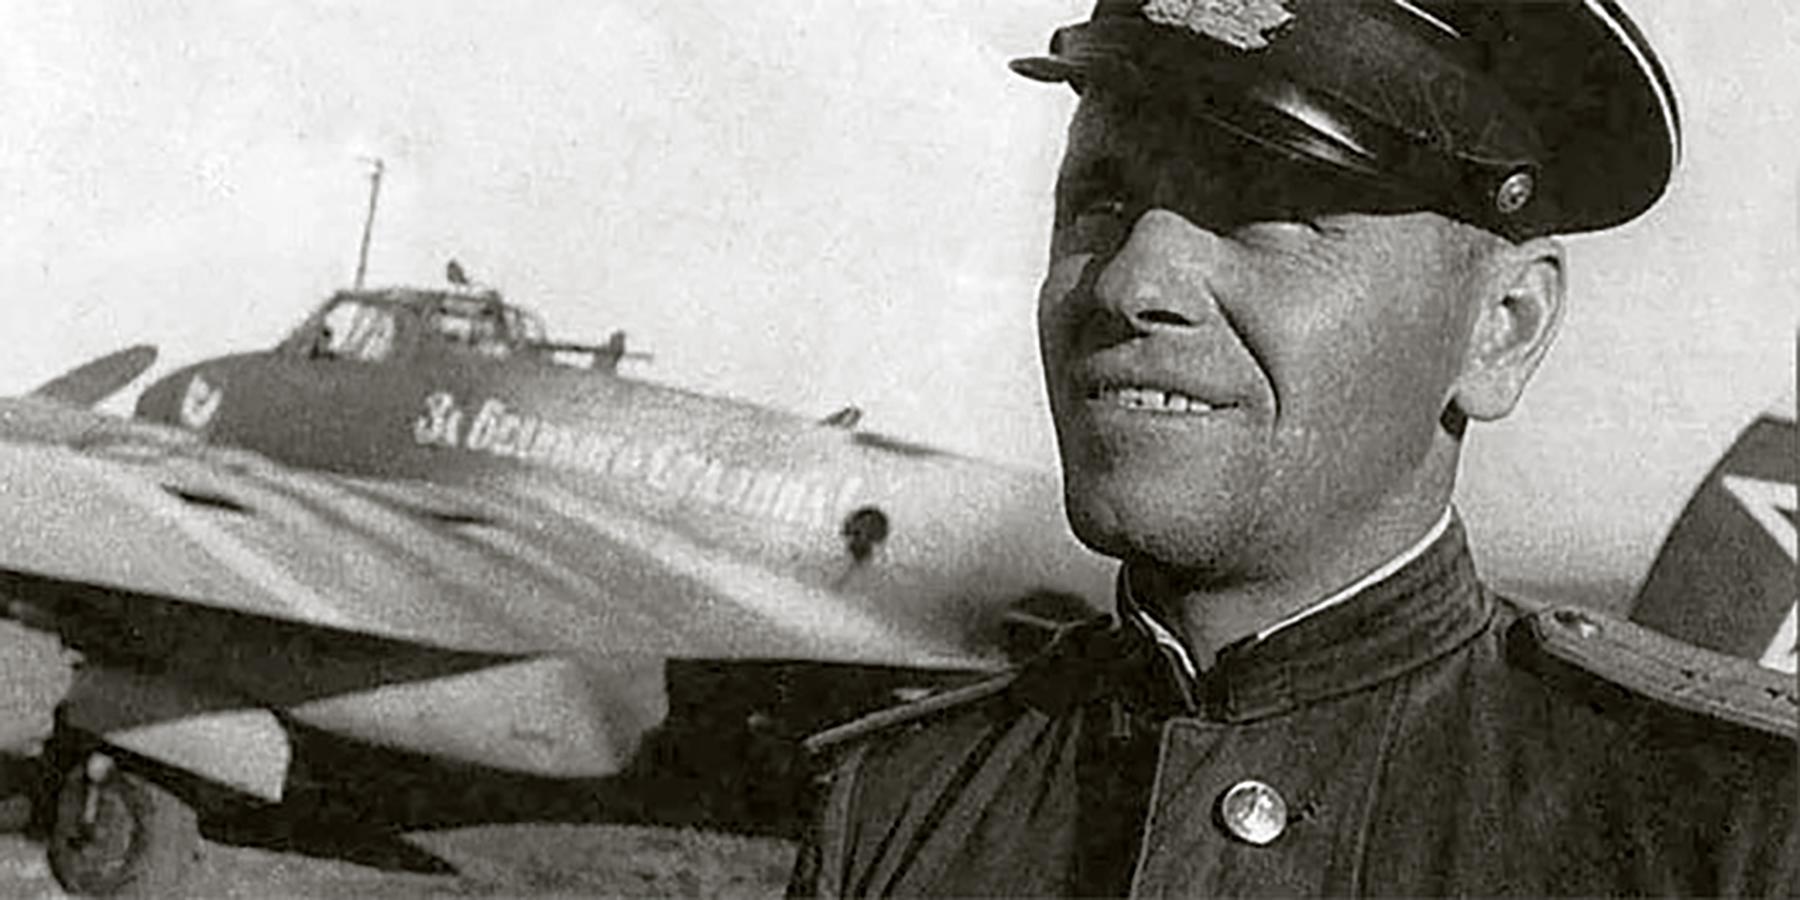 Aircrew Soviet 40GvBAP Hero of the Soviet Union Lt Colonel Korzunov 1944 01